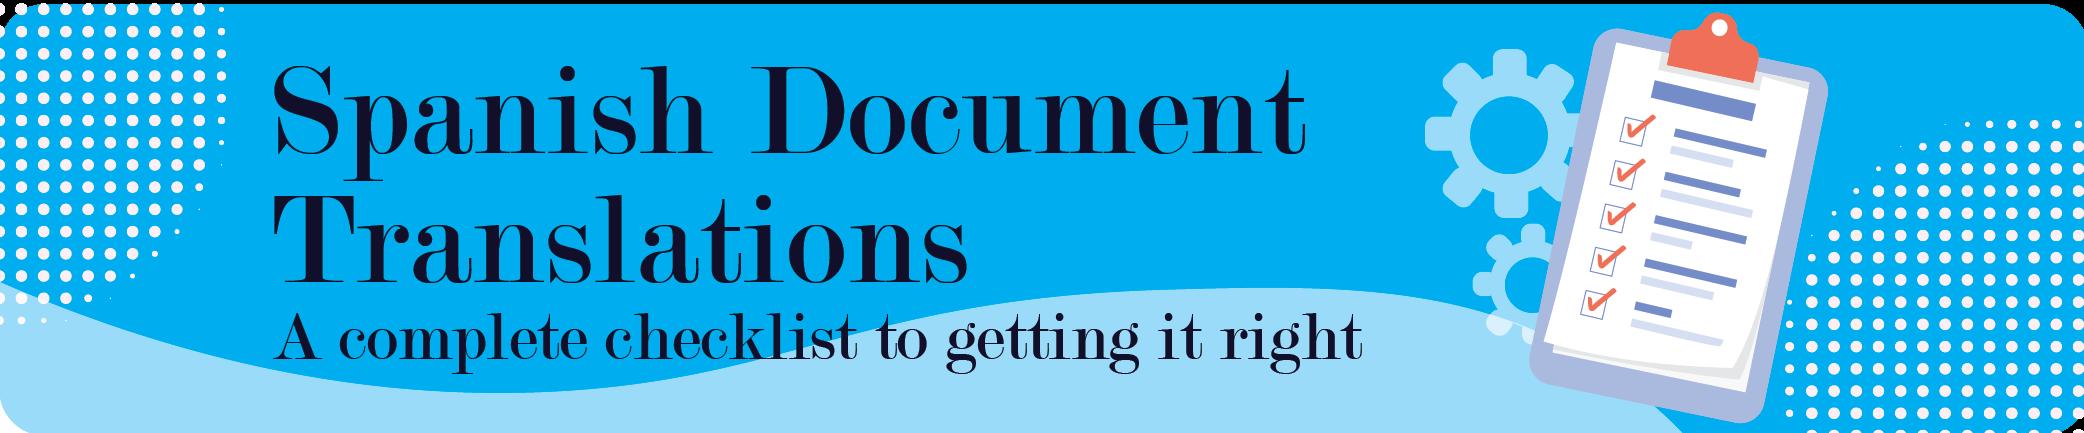 spanish document translations